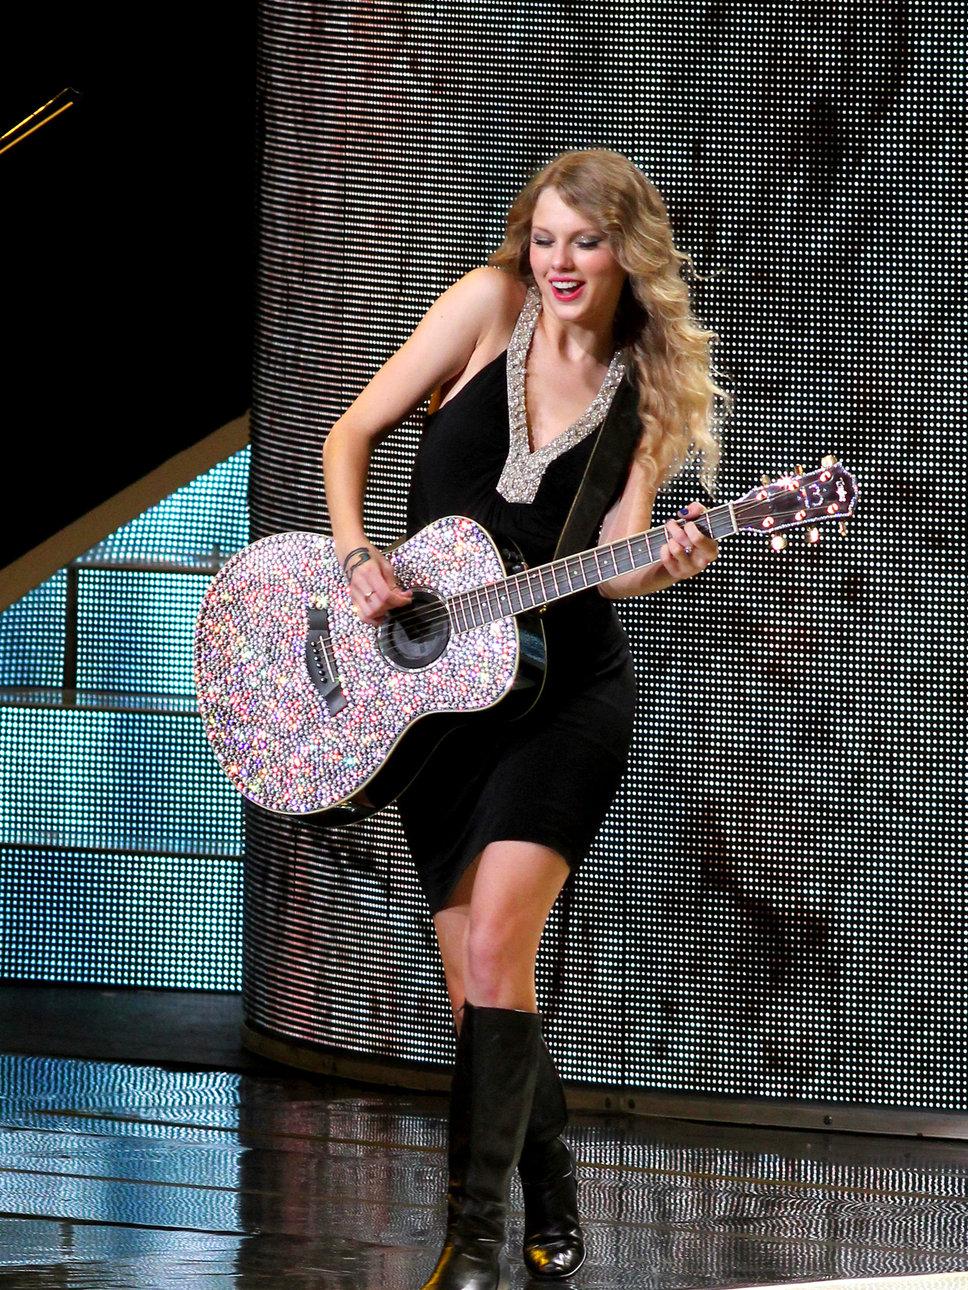 Hot Hd Wallpaper Taylor Swift Hot Wallpaper-1245